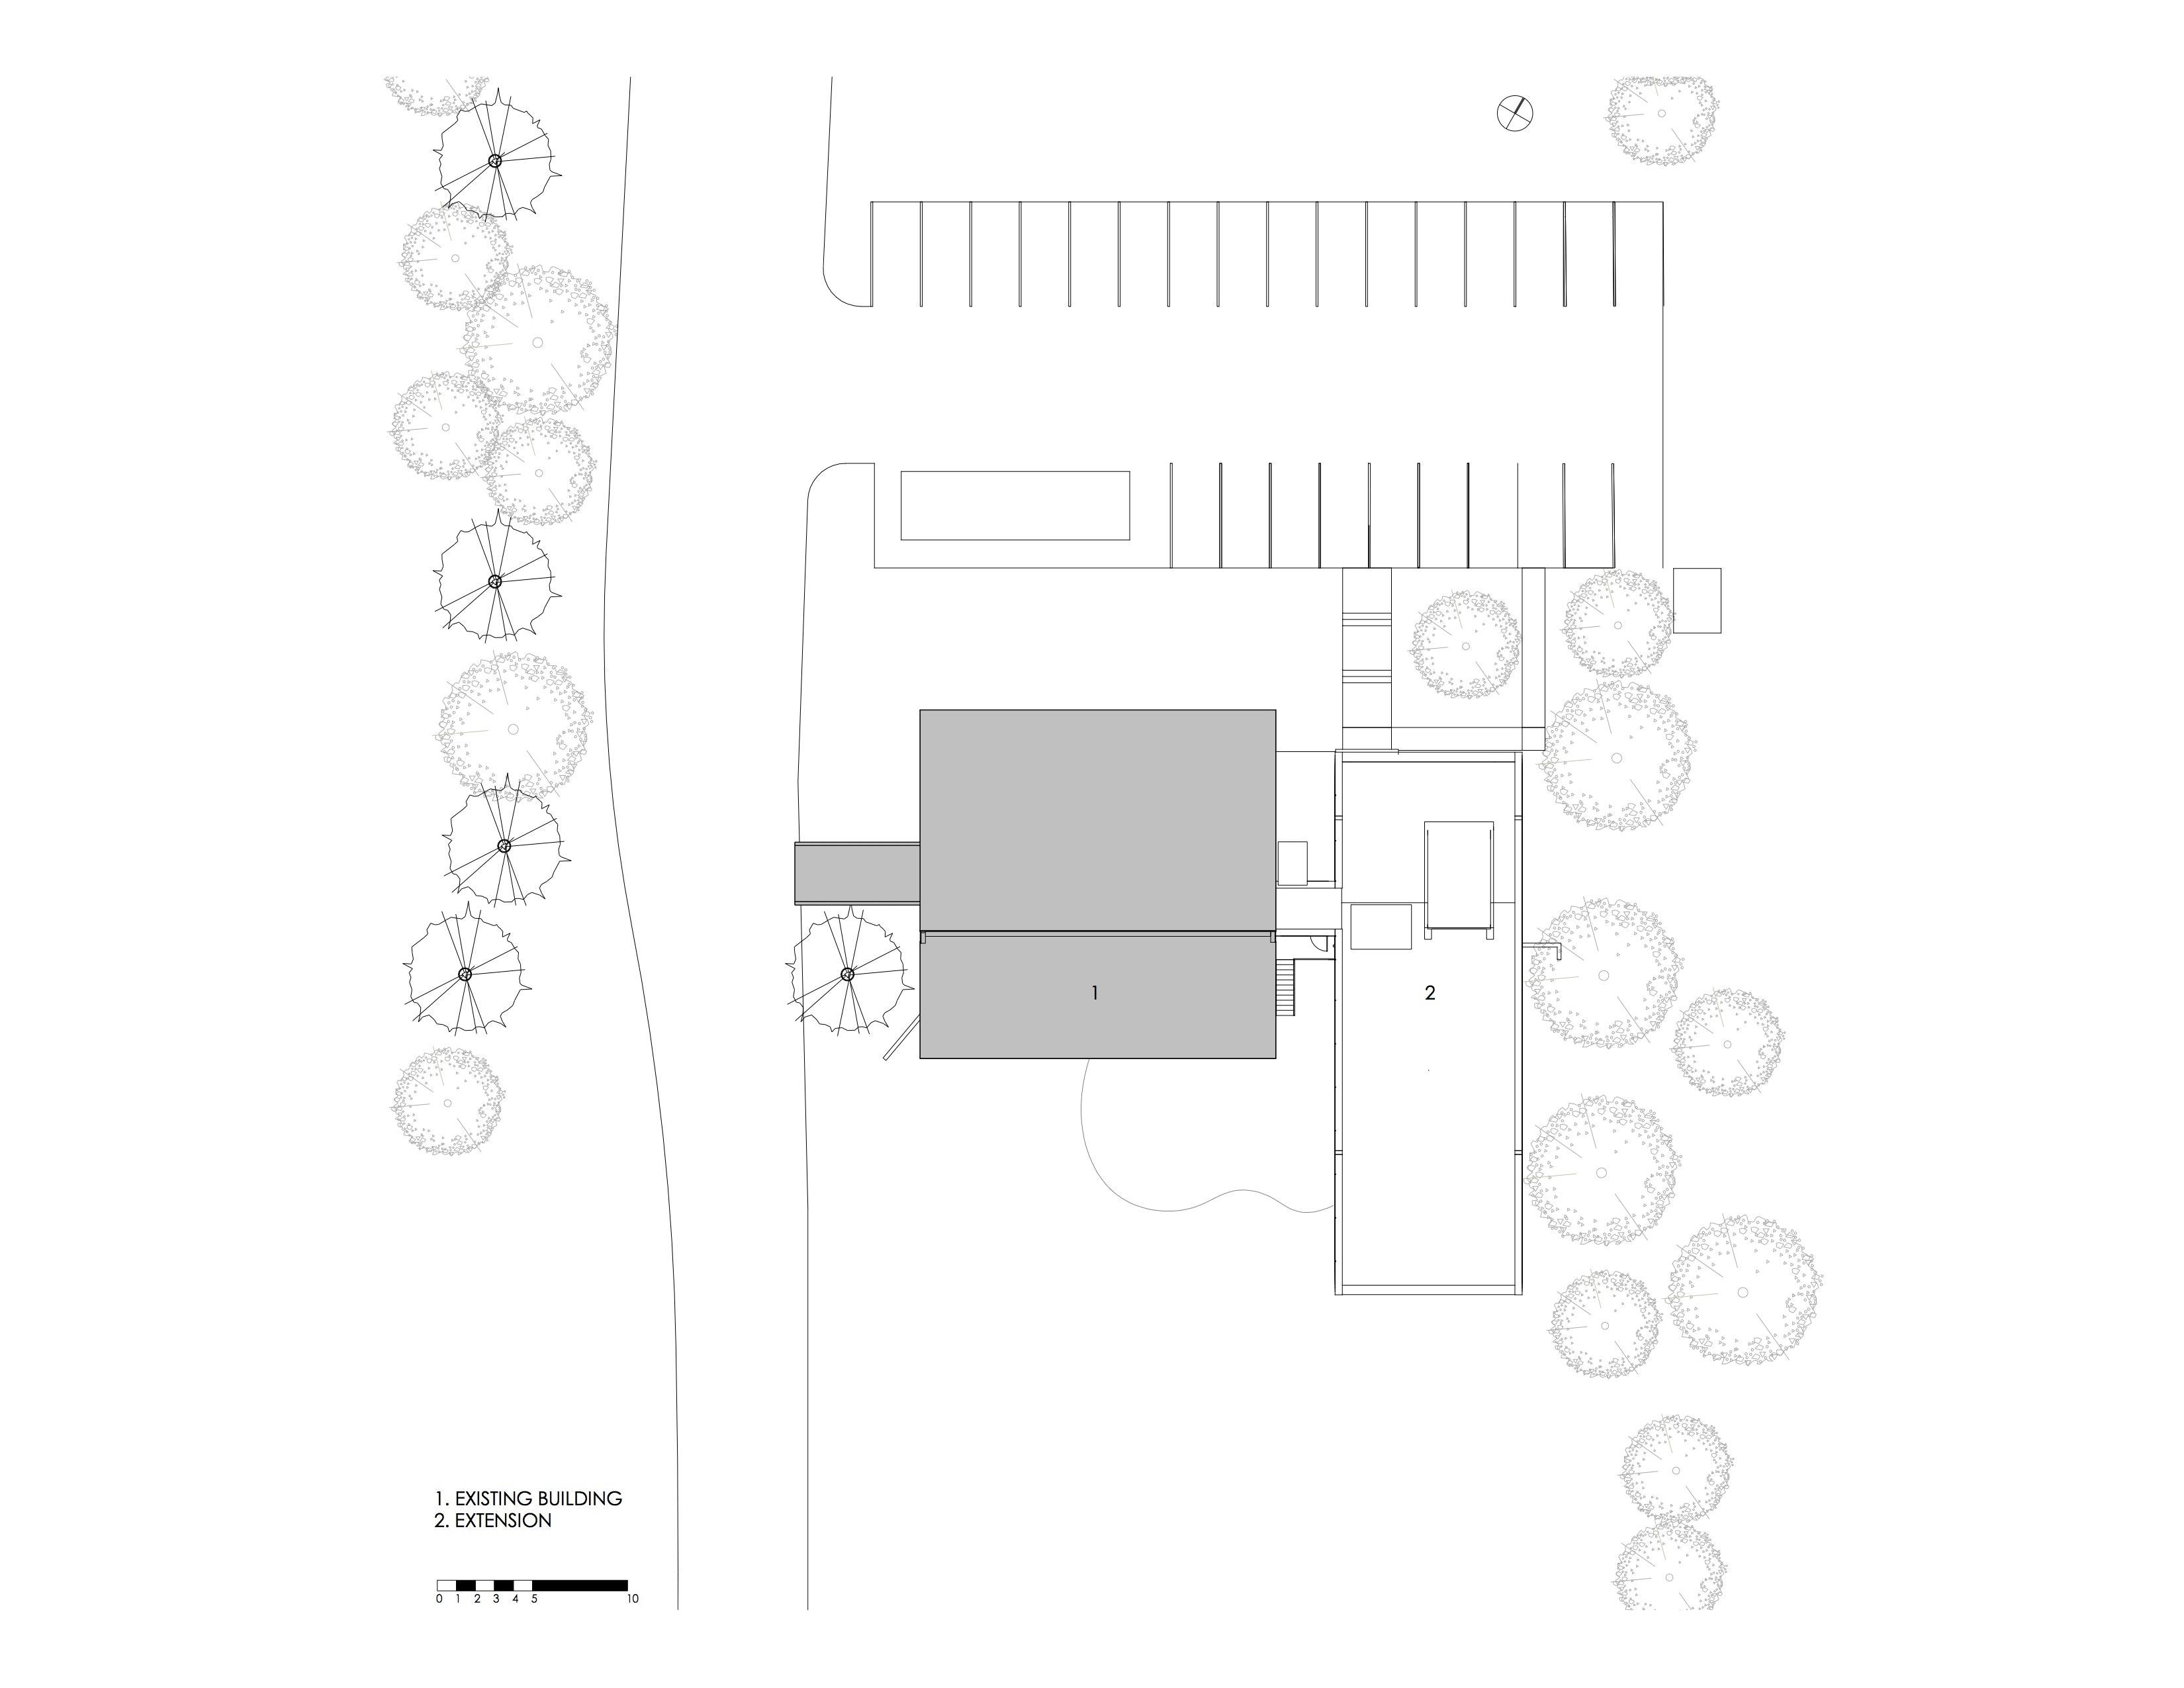 harley davidson wiring diagram darren criss list of wiring gm wiring harness diagram darren criss